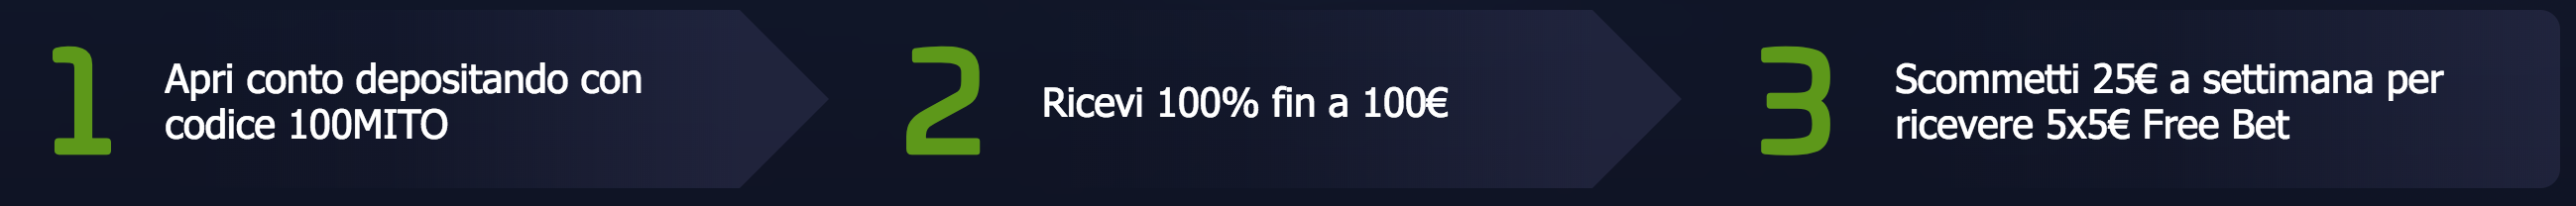 Betrally: Bonus 100Mito